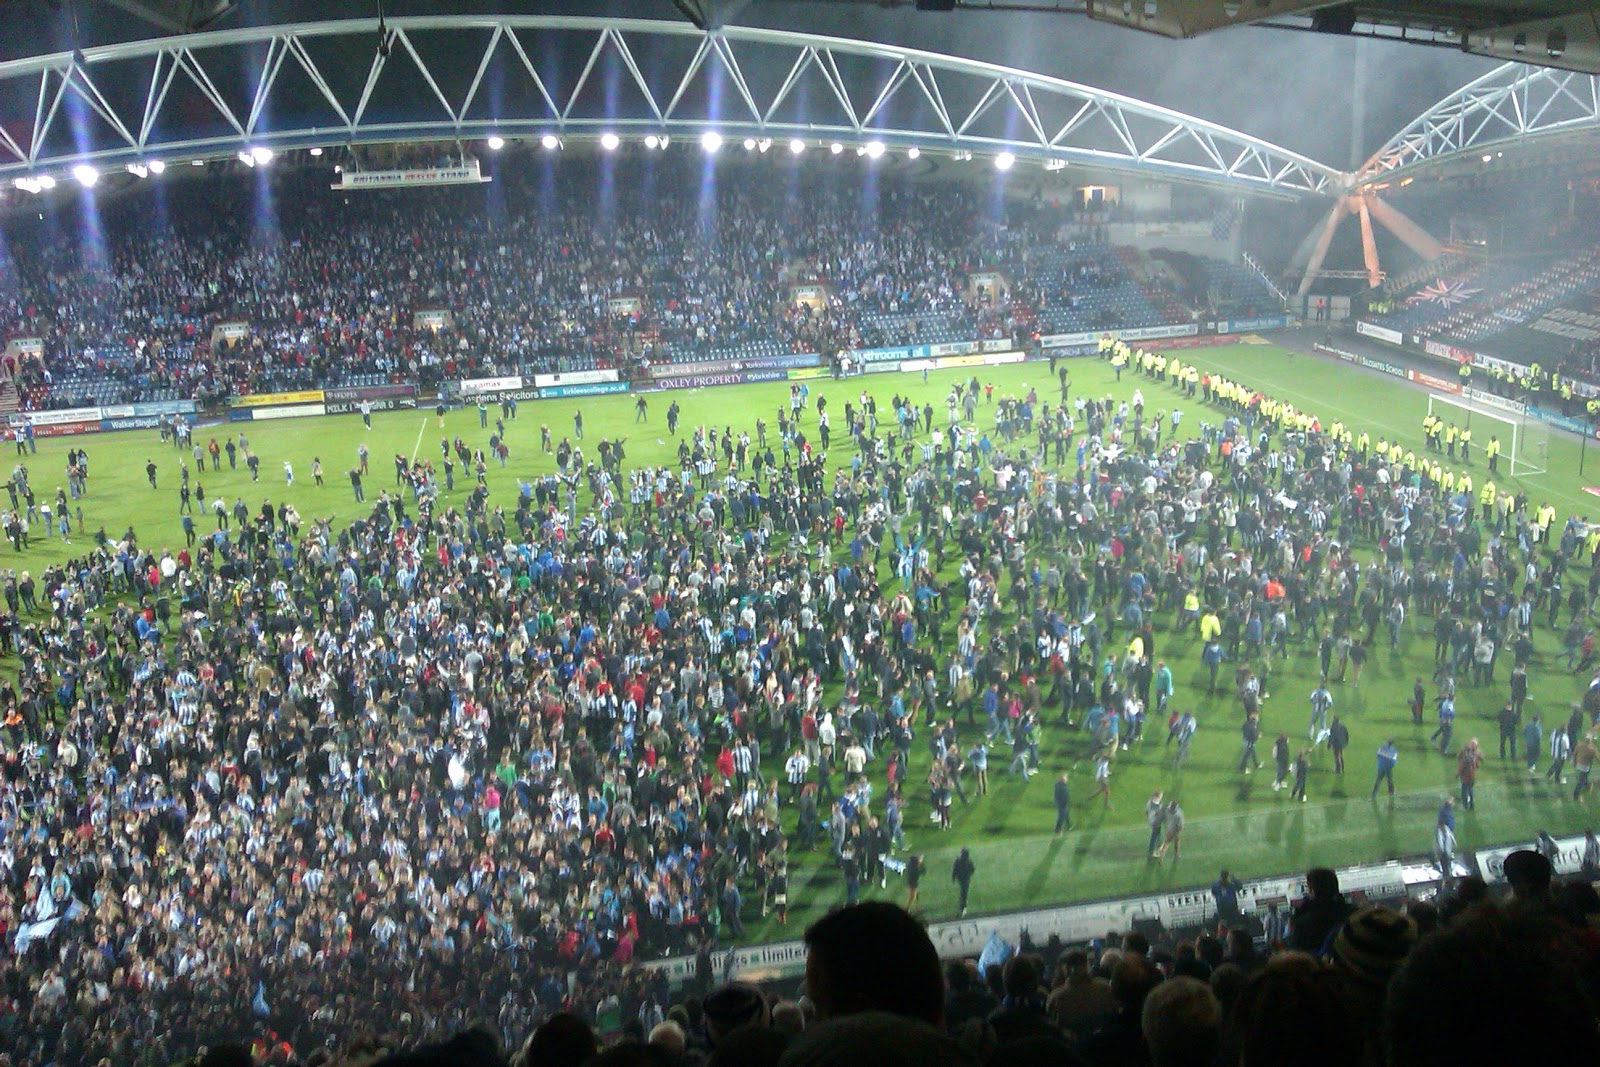 Northern football galpharm stadium huddersfield town pictures